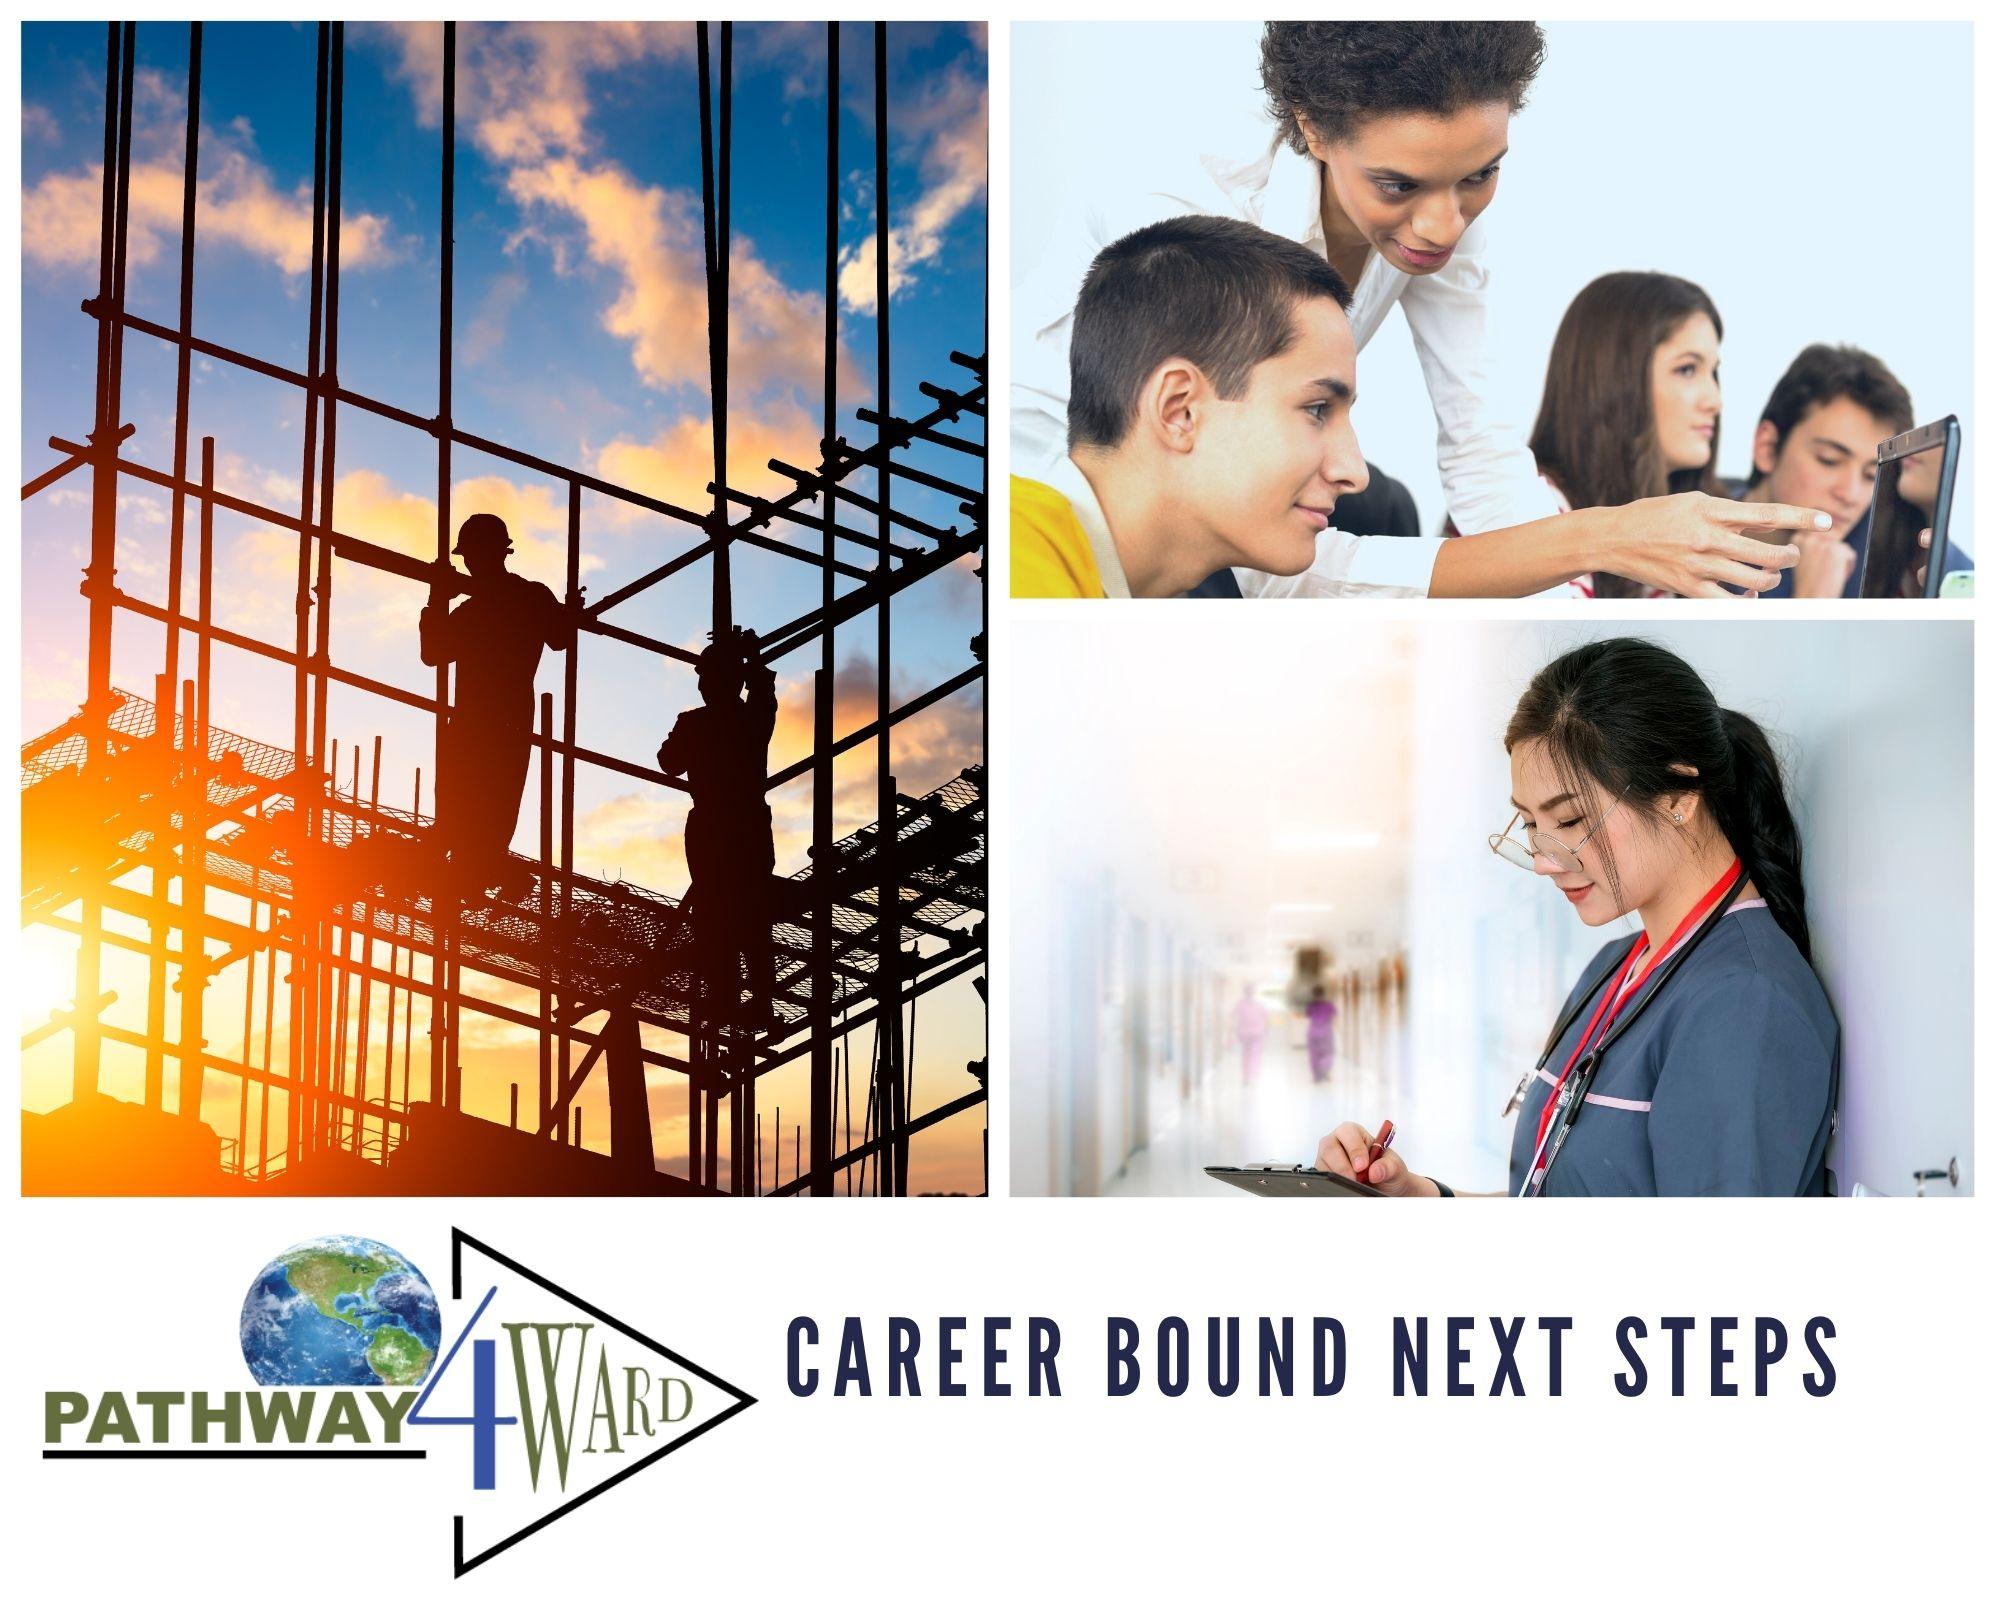 Career Bound Next Steps